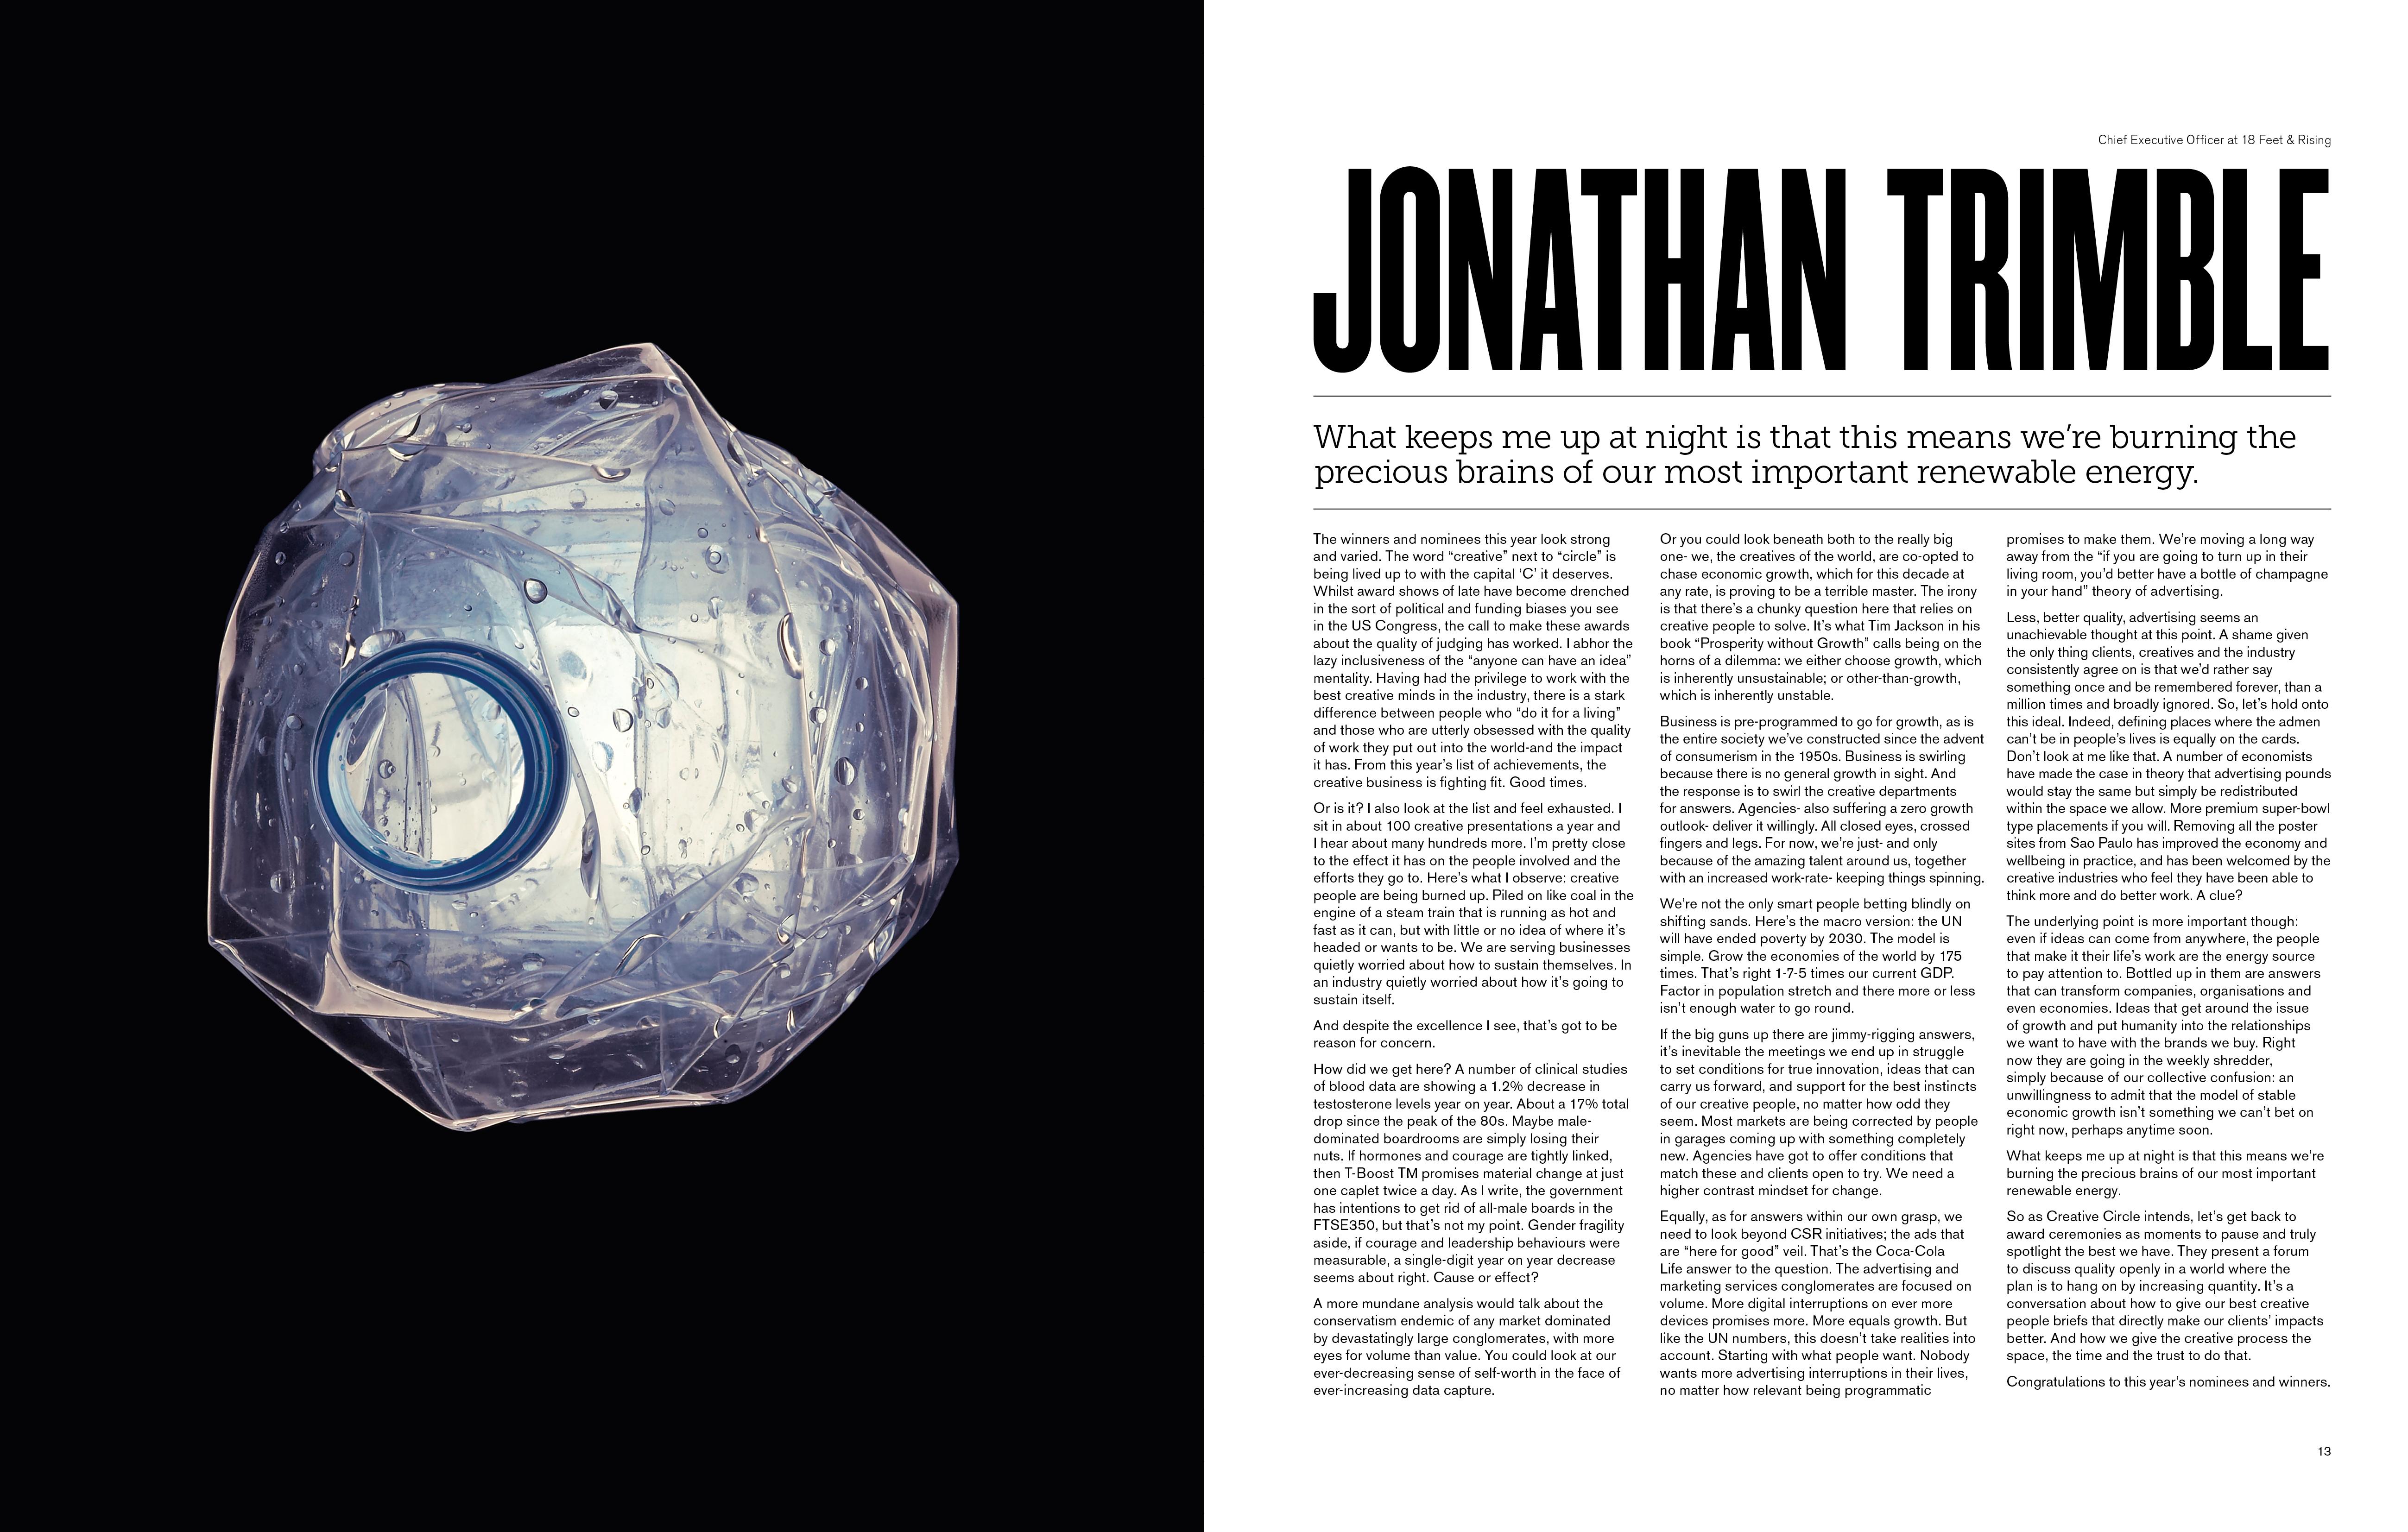 Jonathan Trimble